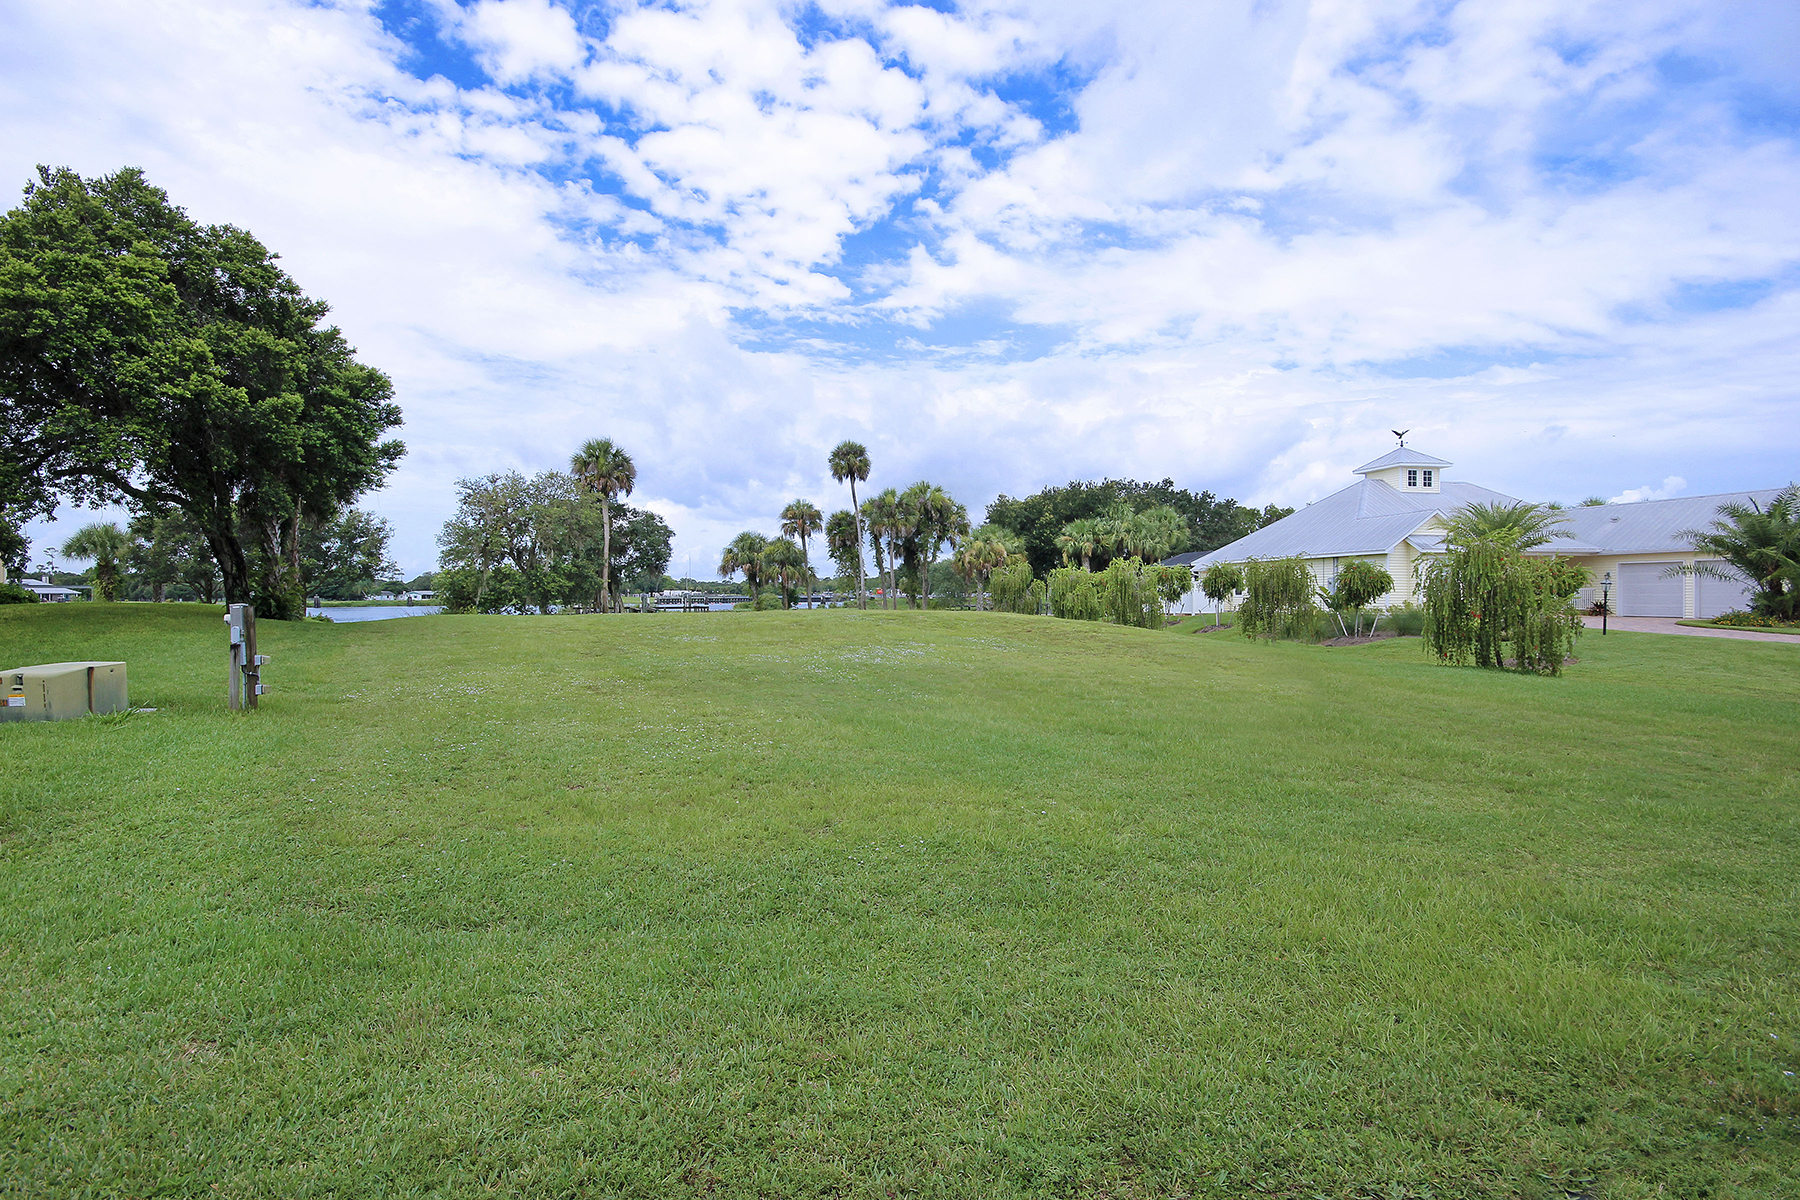 Land for Sale at ALVA 16440 Oakview Cir Alva, Florida 33920 United States